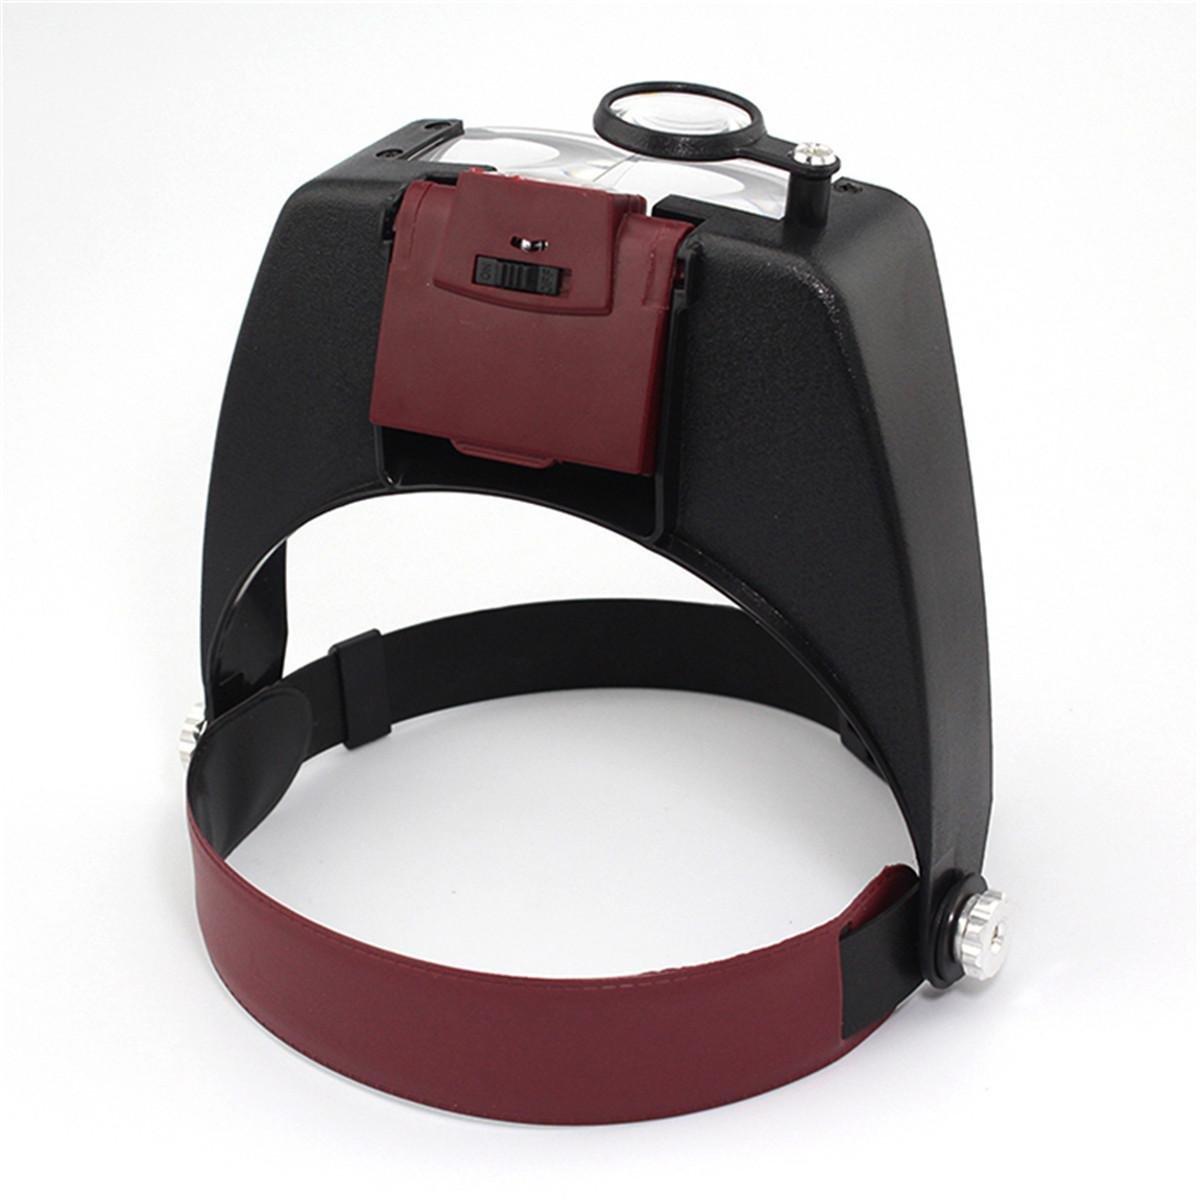 Headband LED Light Magnifier Headset Adjustable Lens Headlamp Magnifying Tool Jeweler Loupe Reading Glasses with Light